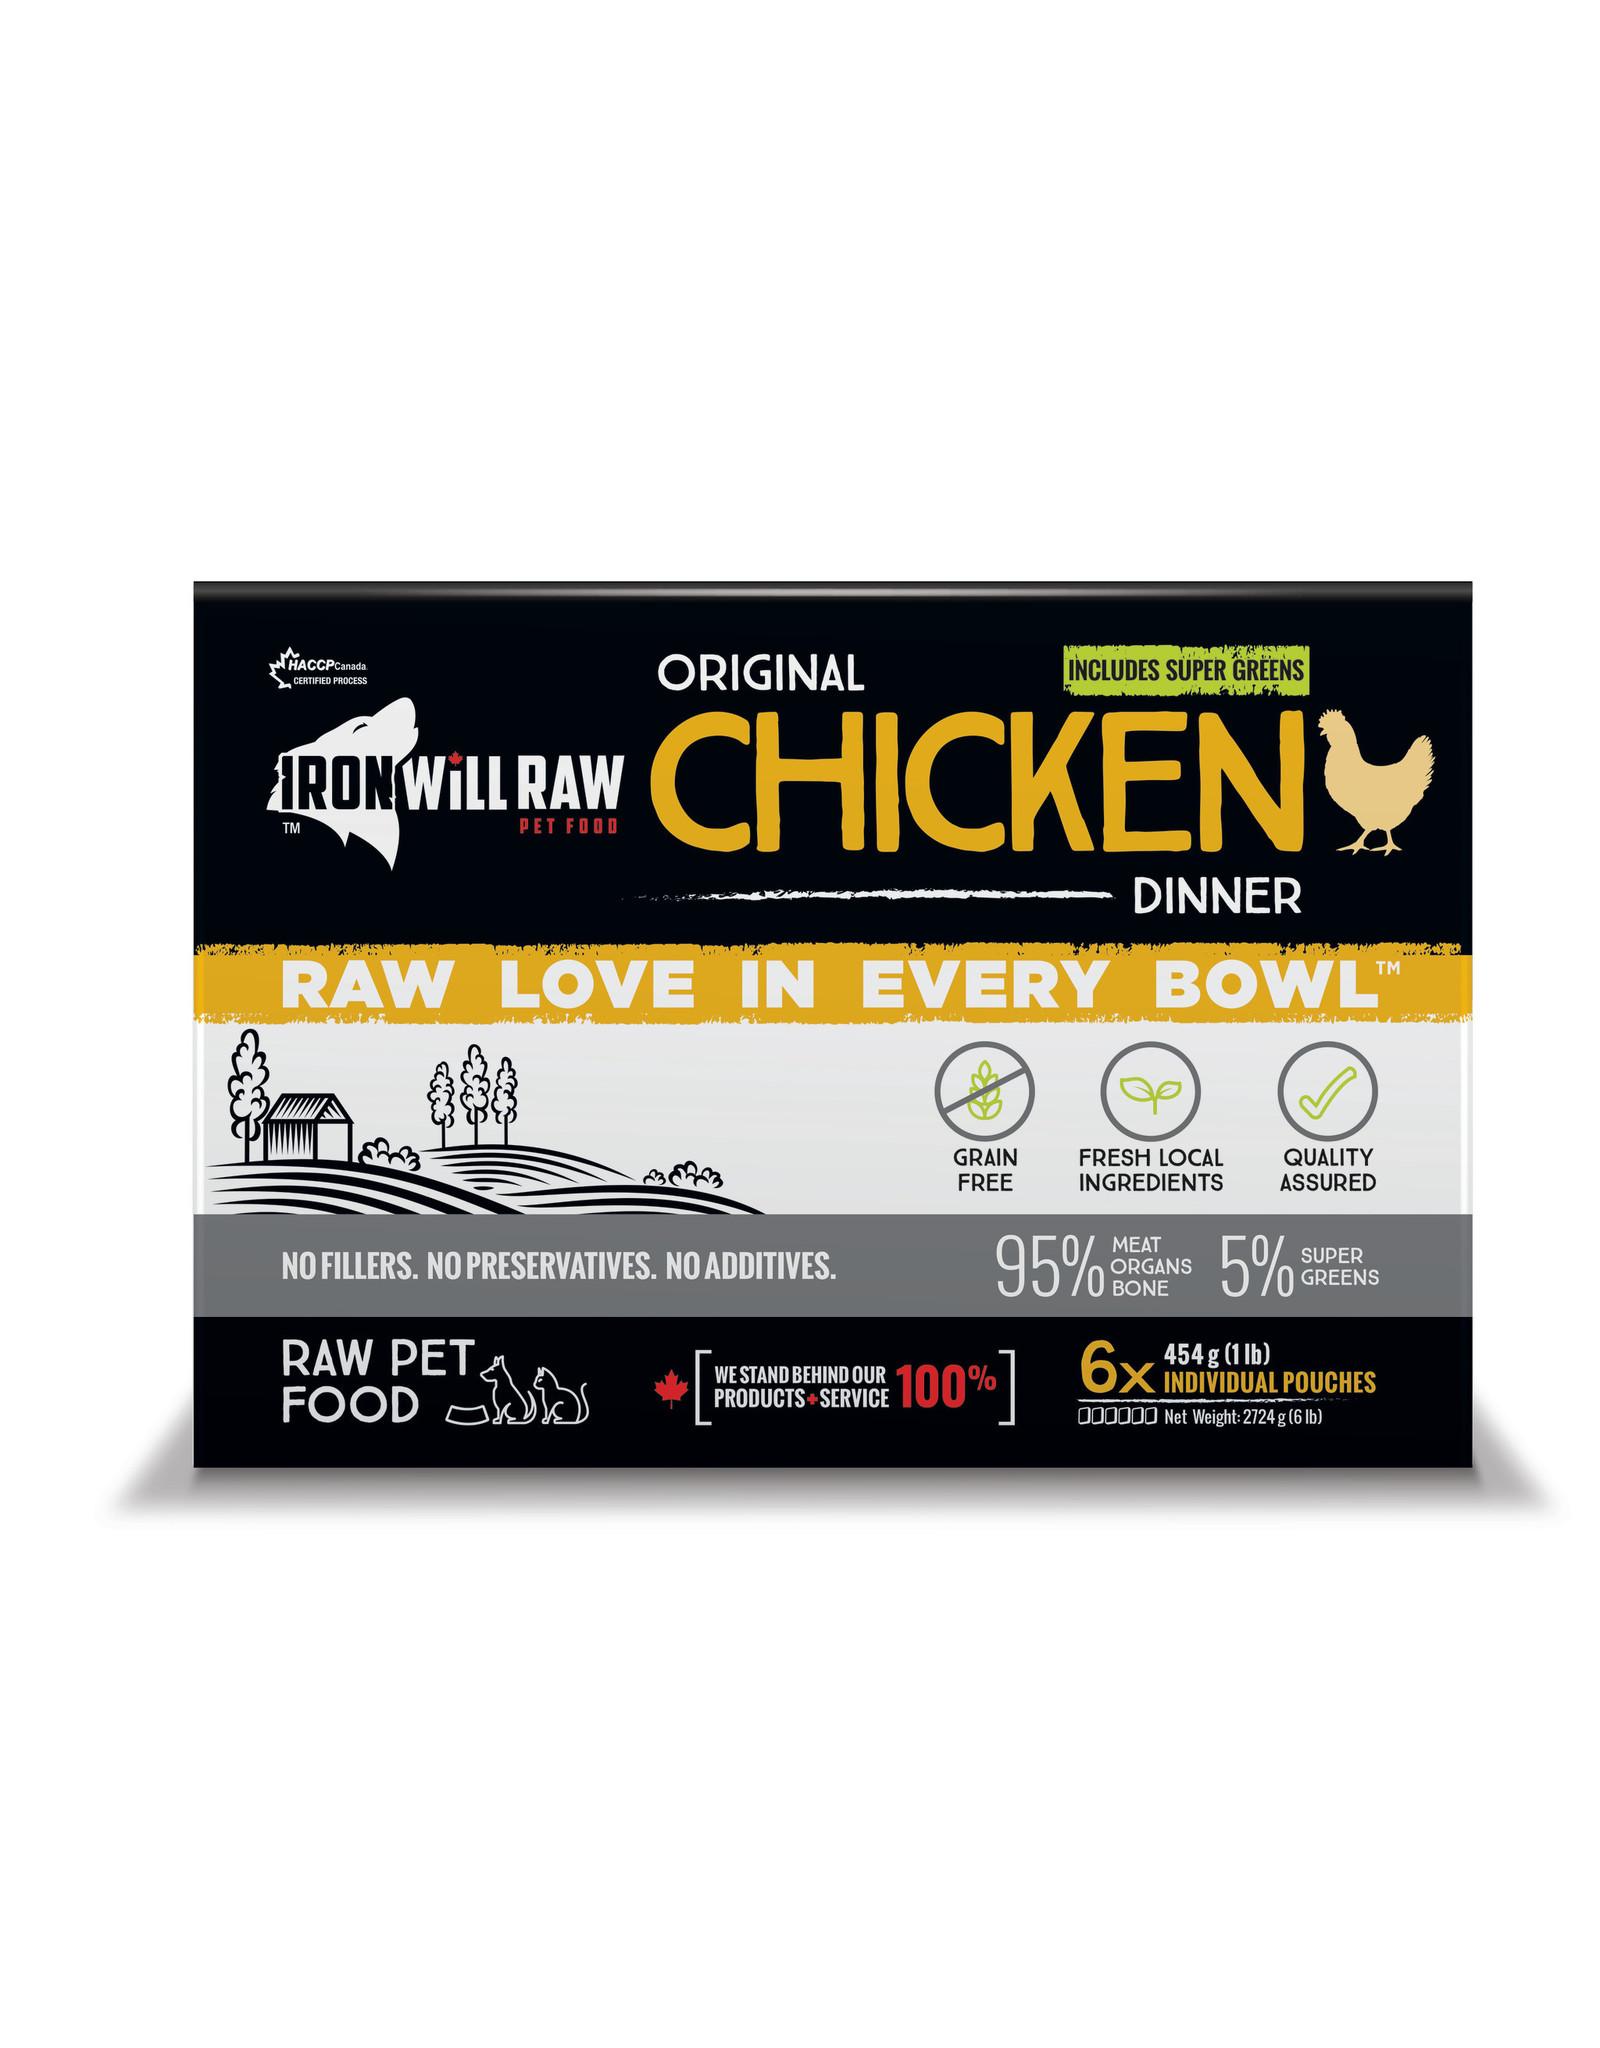 Iron Will Raw Iron Will Original Chicken Dinner 6lb Box